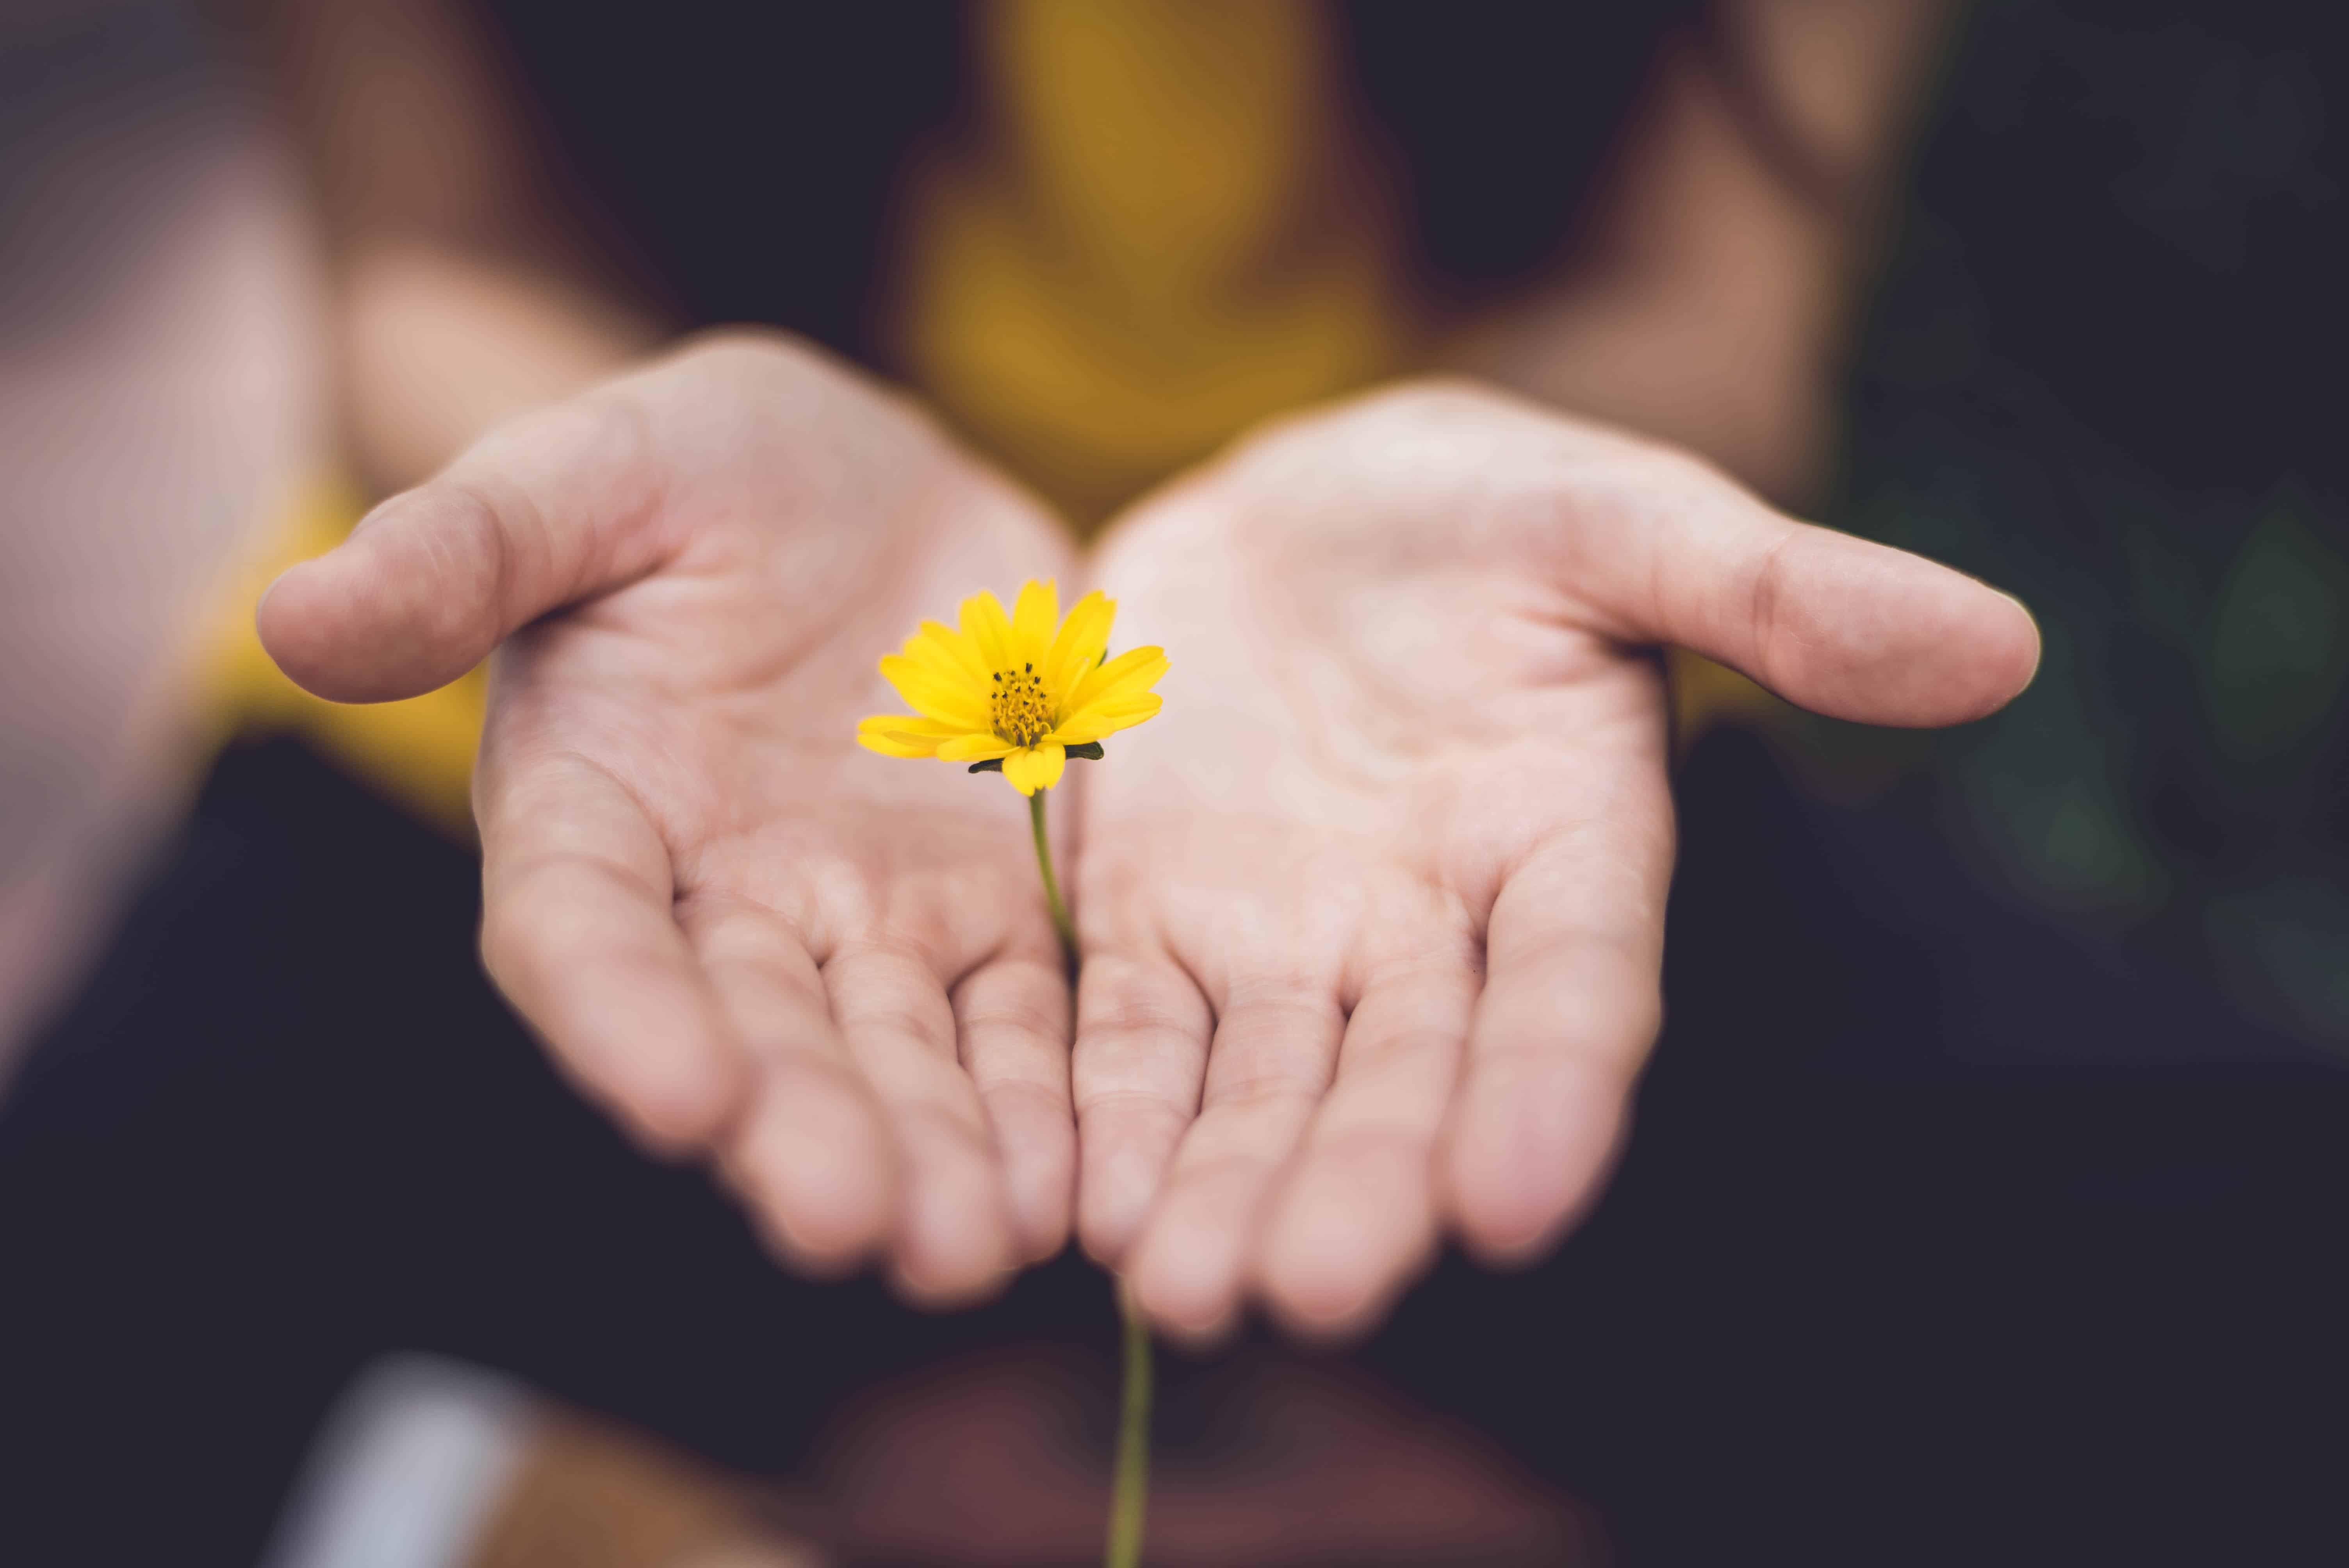 meditative hands and flower